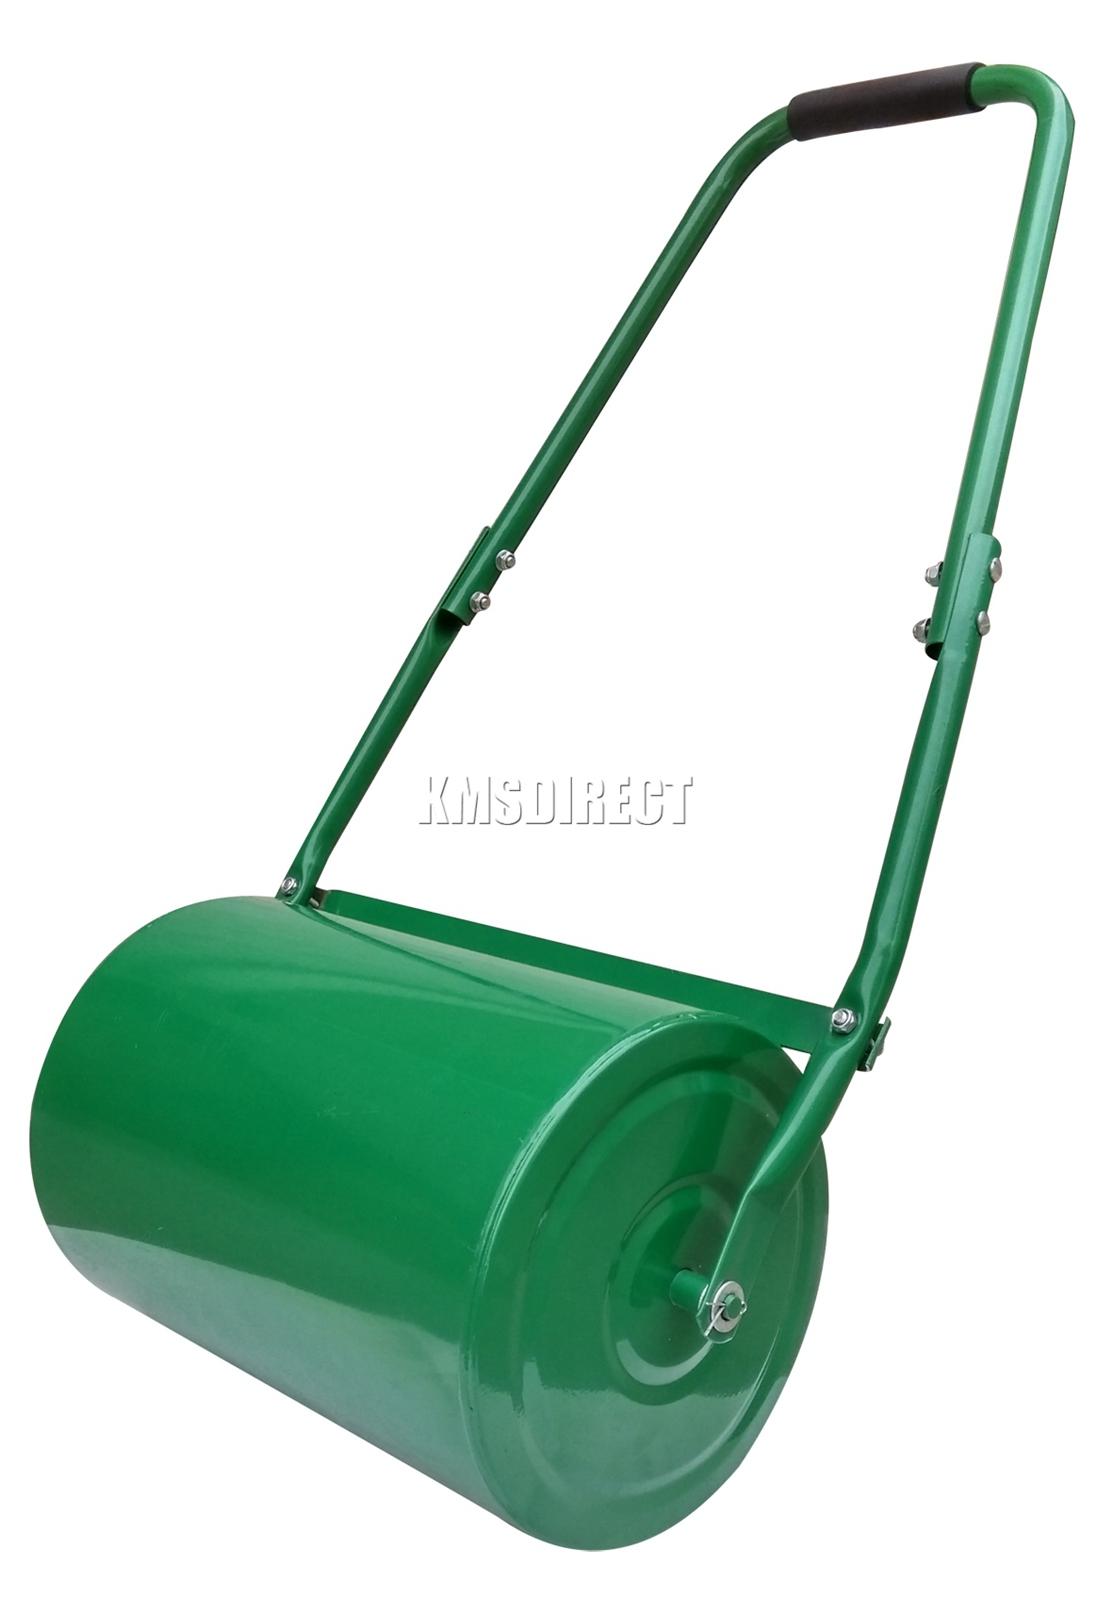 New Heavy Duty Steel Garden Grass Lawn Roller 30L or 46L Green Water Sand Filled